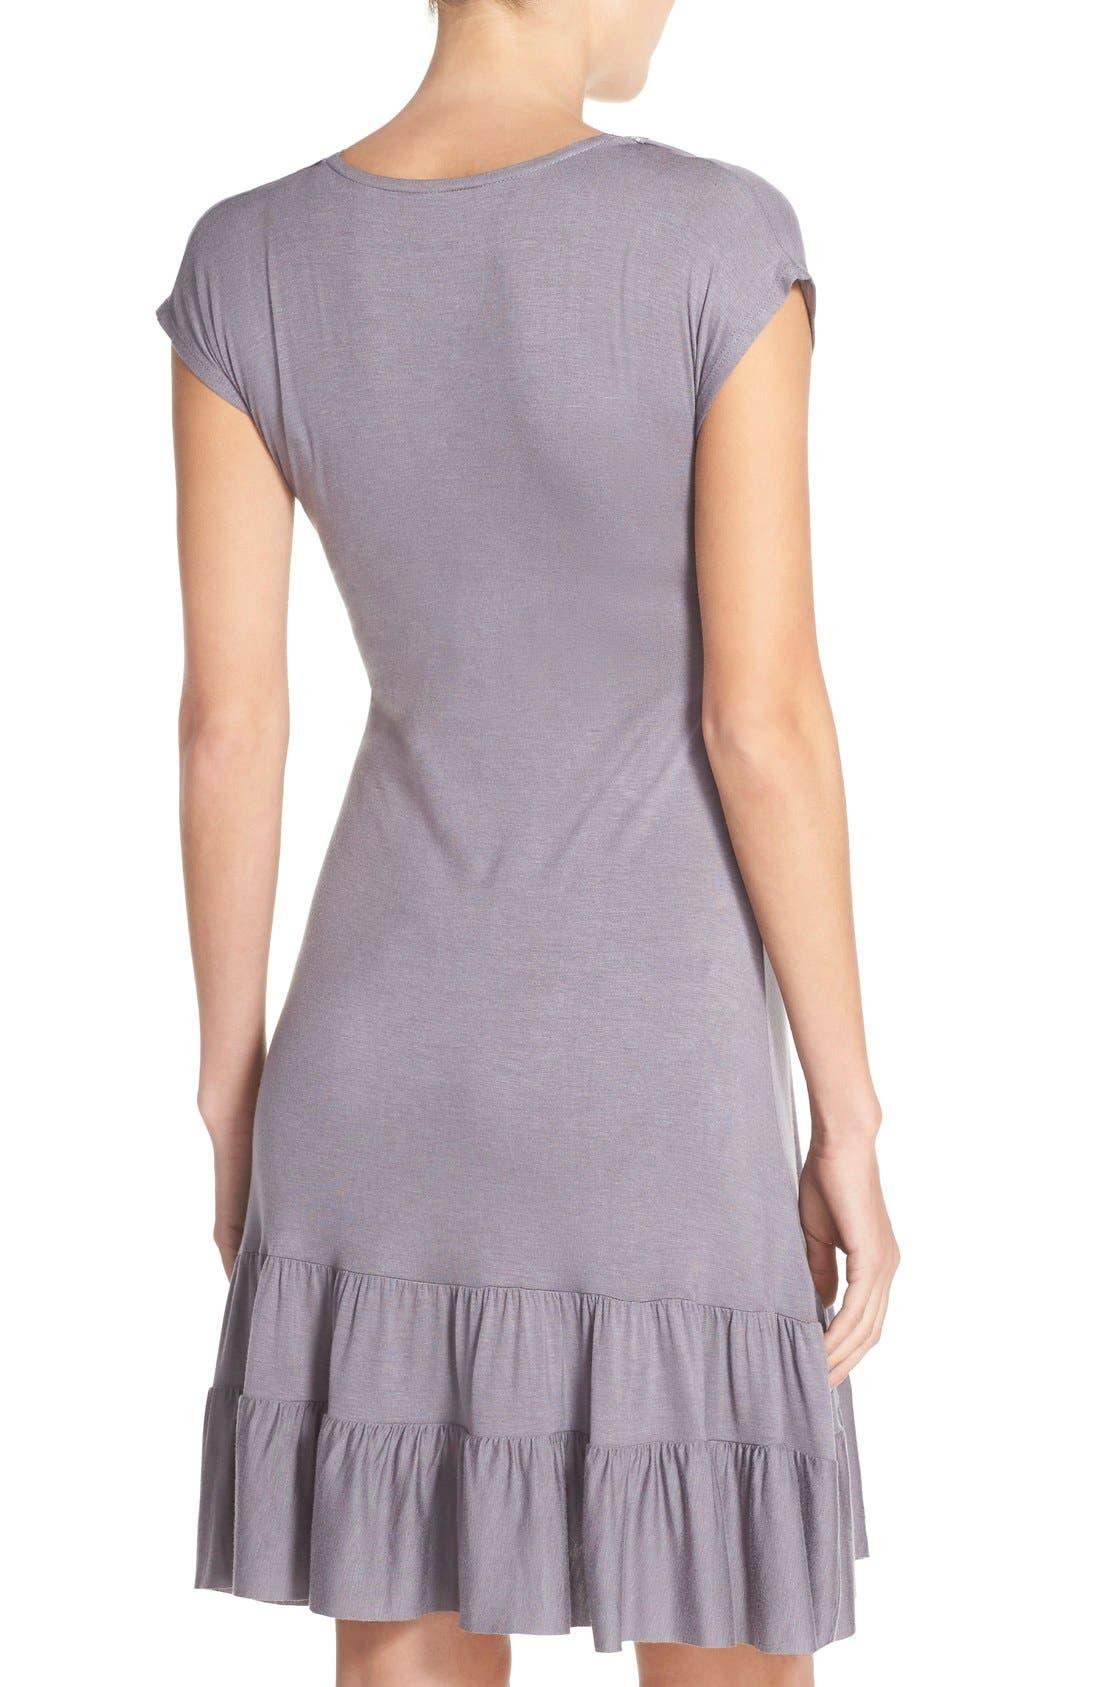 Ruffle Nursing Dress,                             Alternate thumbnail 2, color,                             Gunmetal